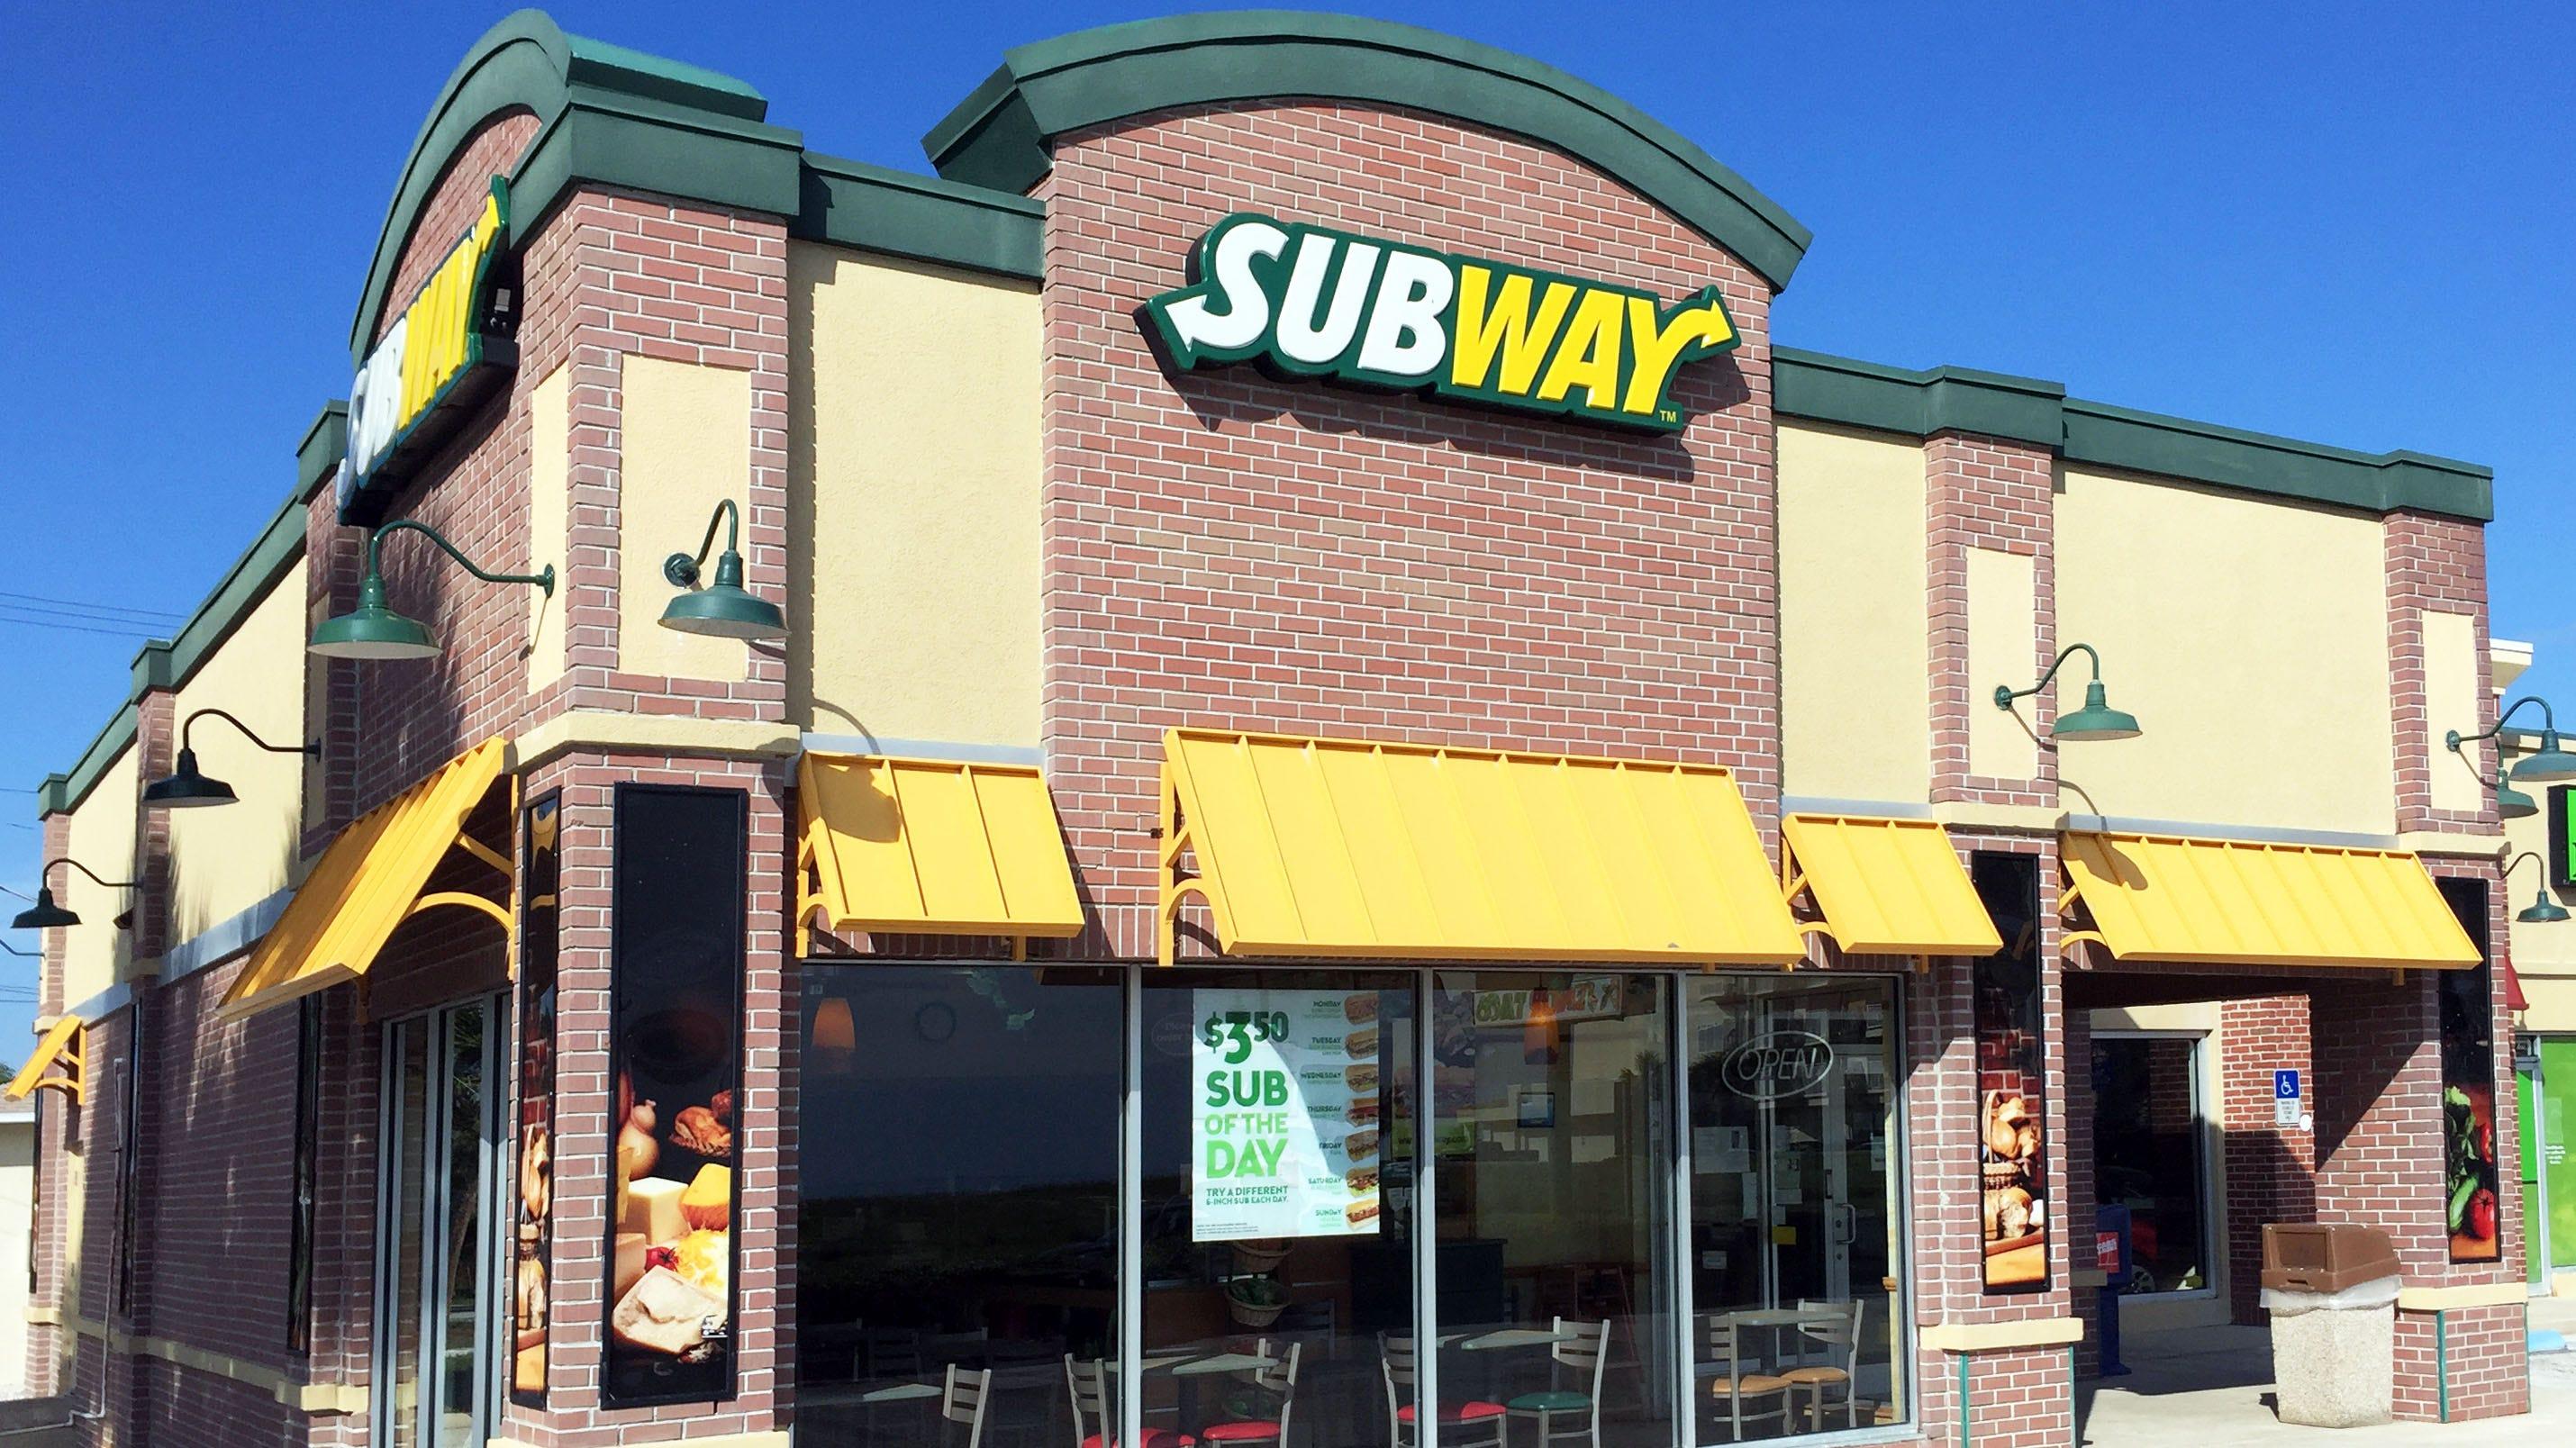 Westlake Legal Group Subway-restaurant Thief breaks into Subway sandwich shop, fixes himself chicken hero New York Post fox-news/us/crime fox-news/travel/vacation-destinations/washington-dc fnc/us fnc Ben Feuerherd article 85ae985b-b084-5d3d-8998-ce77d82a5cba